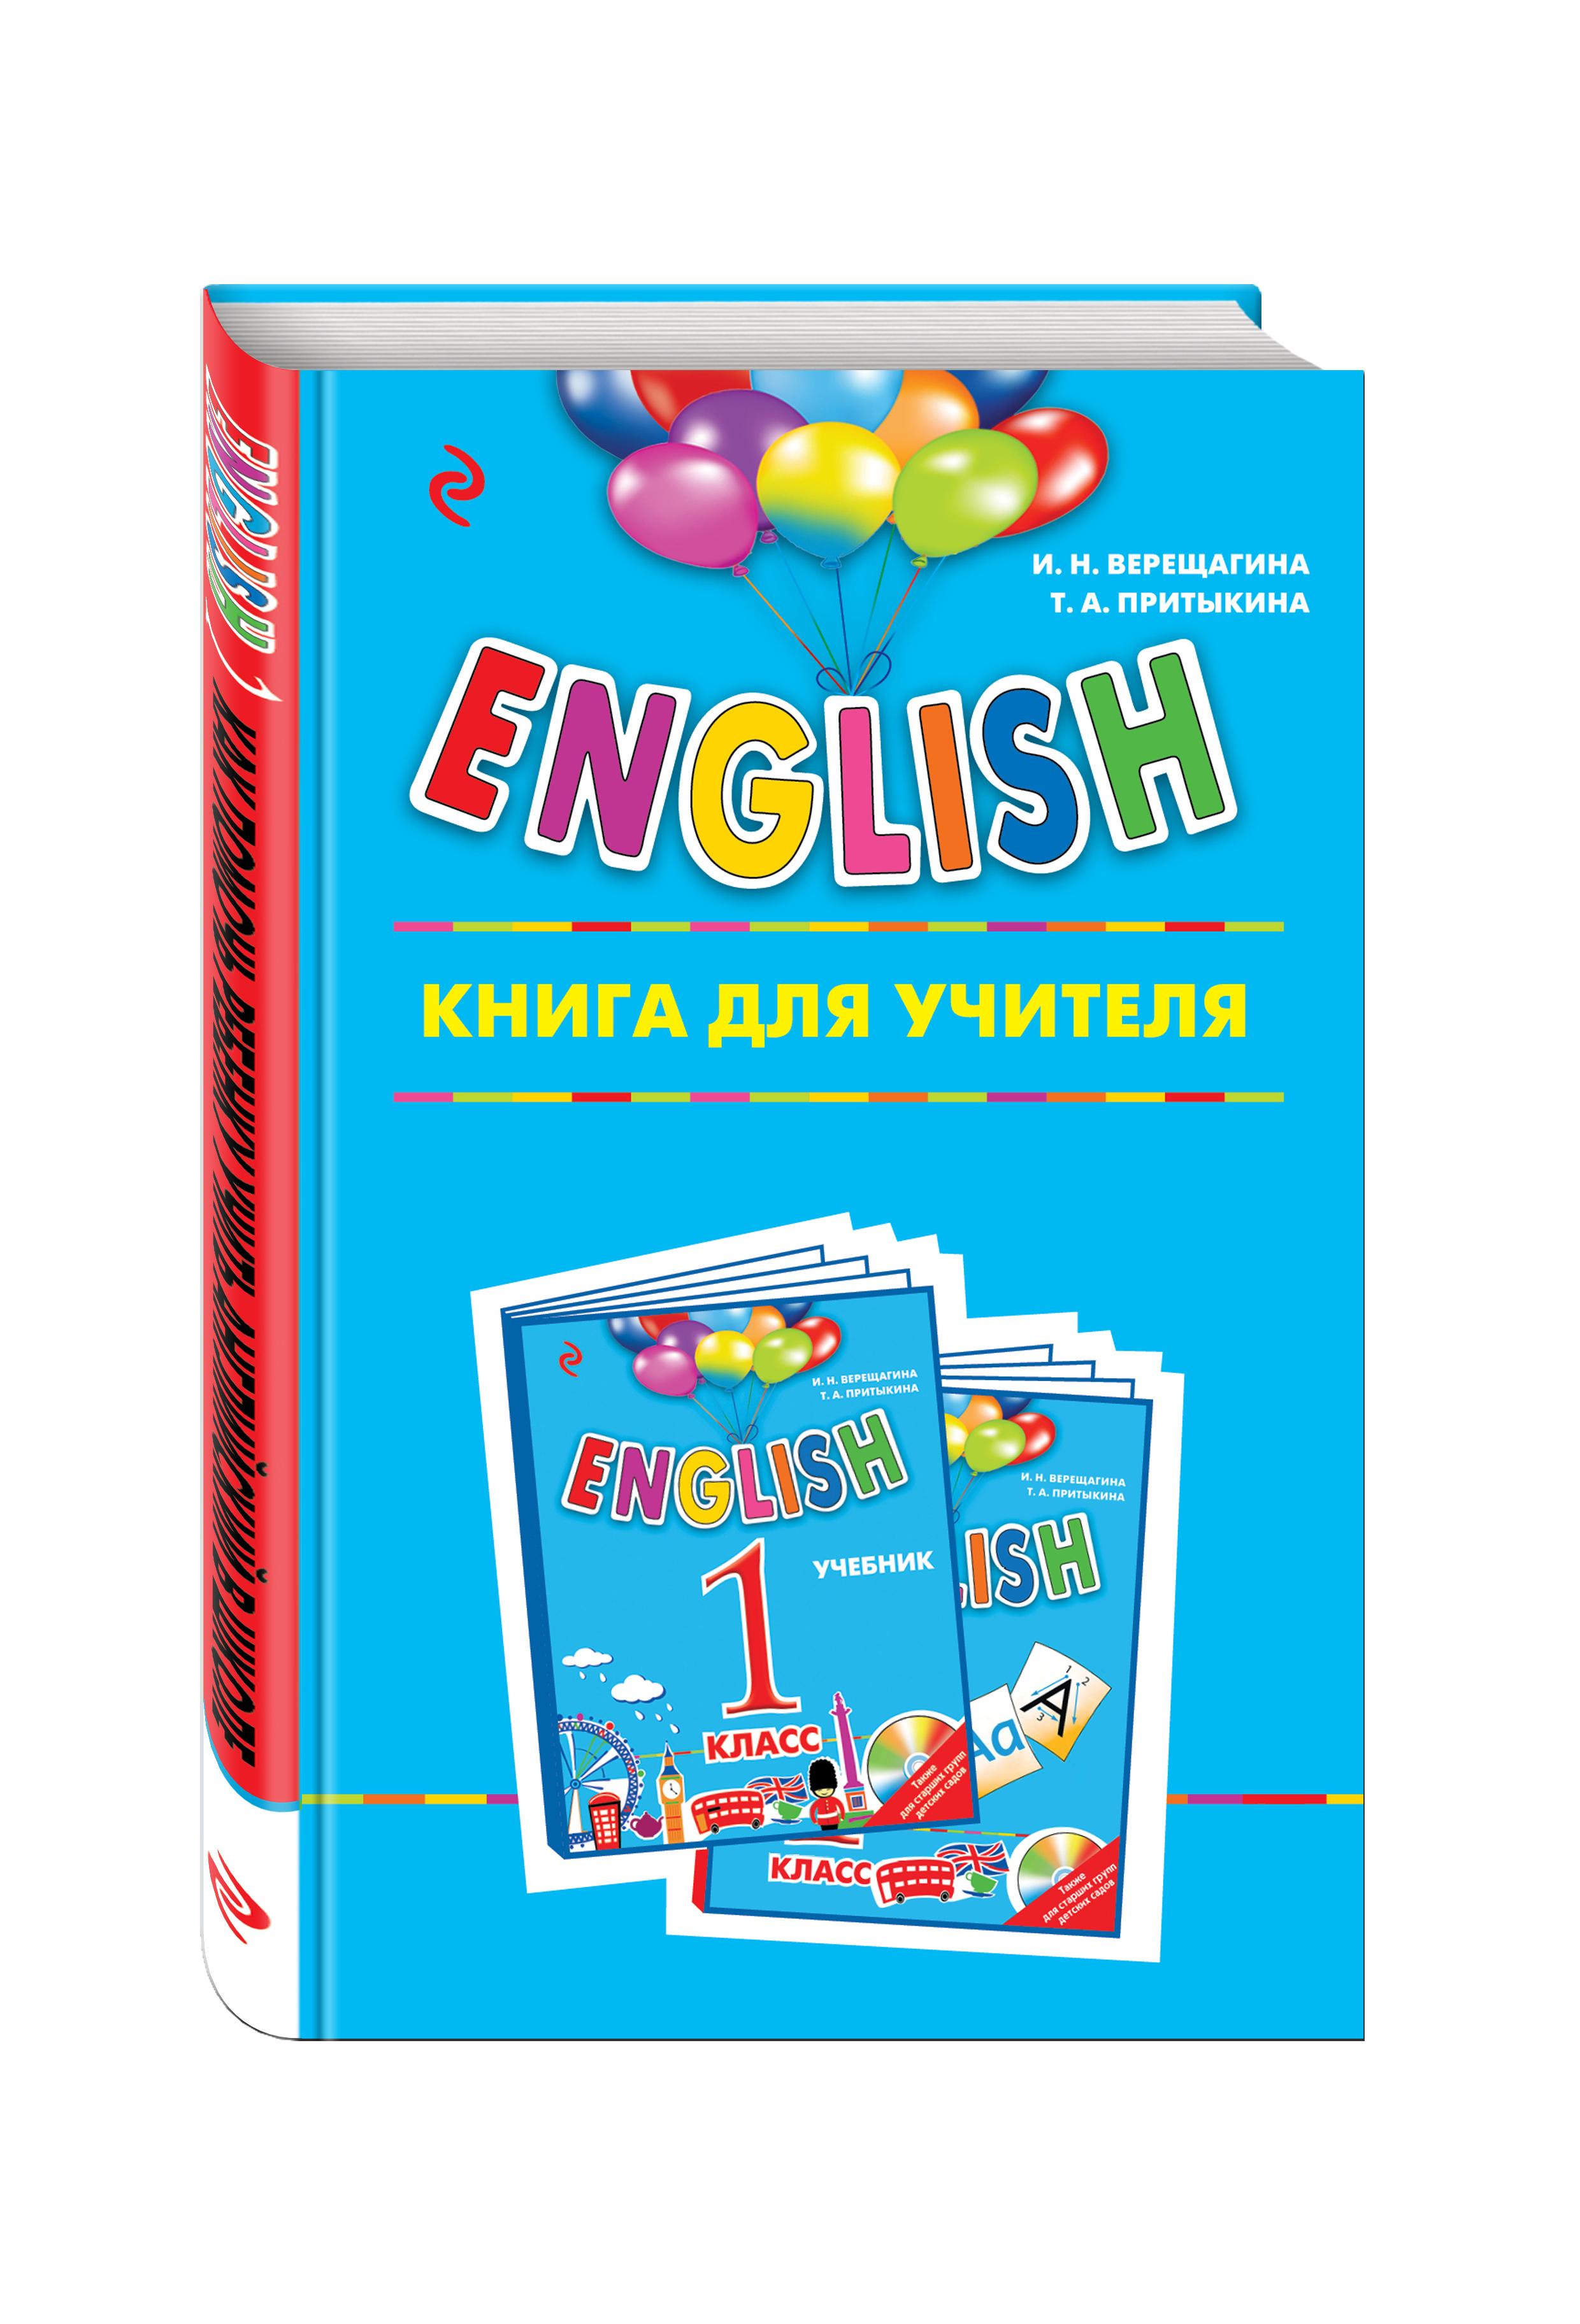 ENGLISH. 1 класс. Книга для учителя ( Верещагина И.Н., Притыкина Т.А.  )